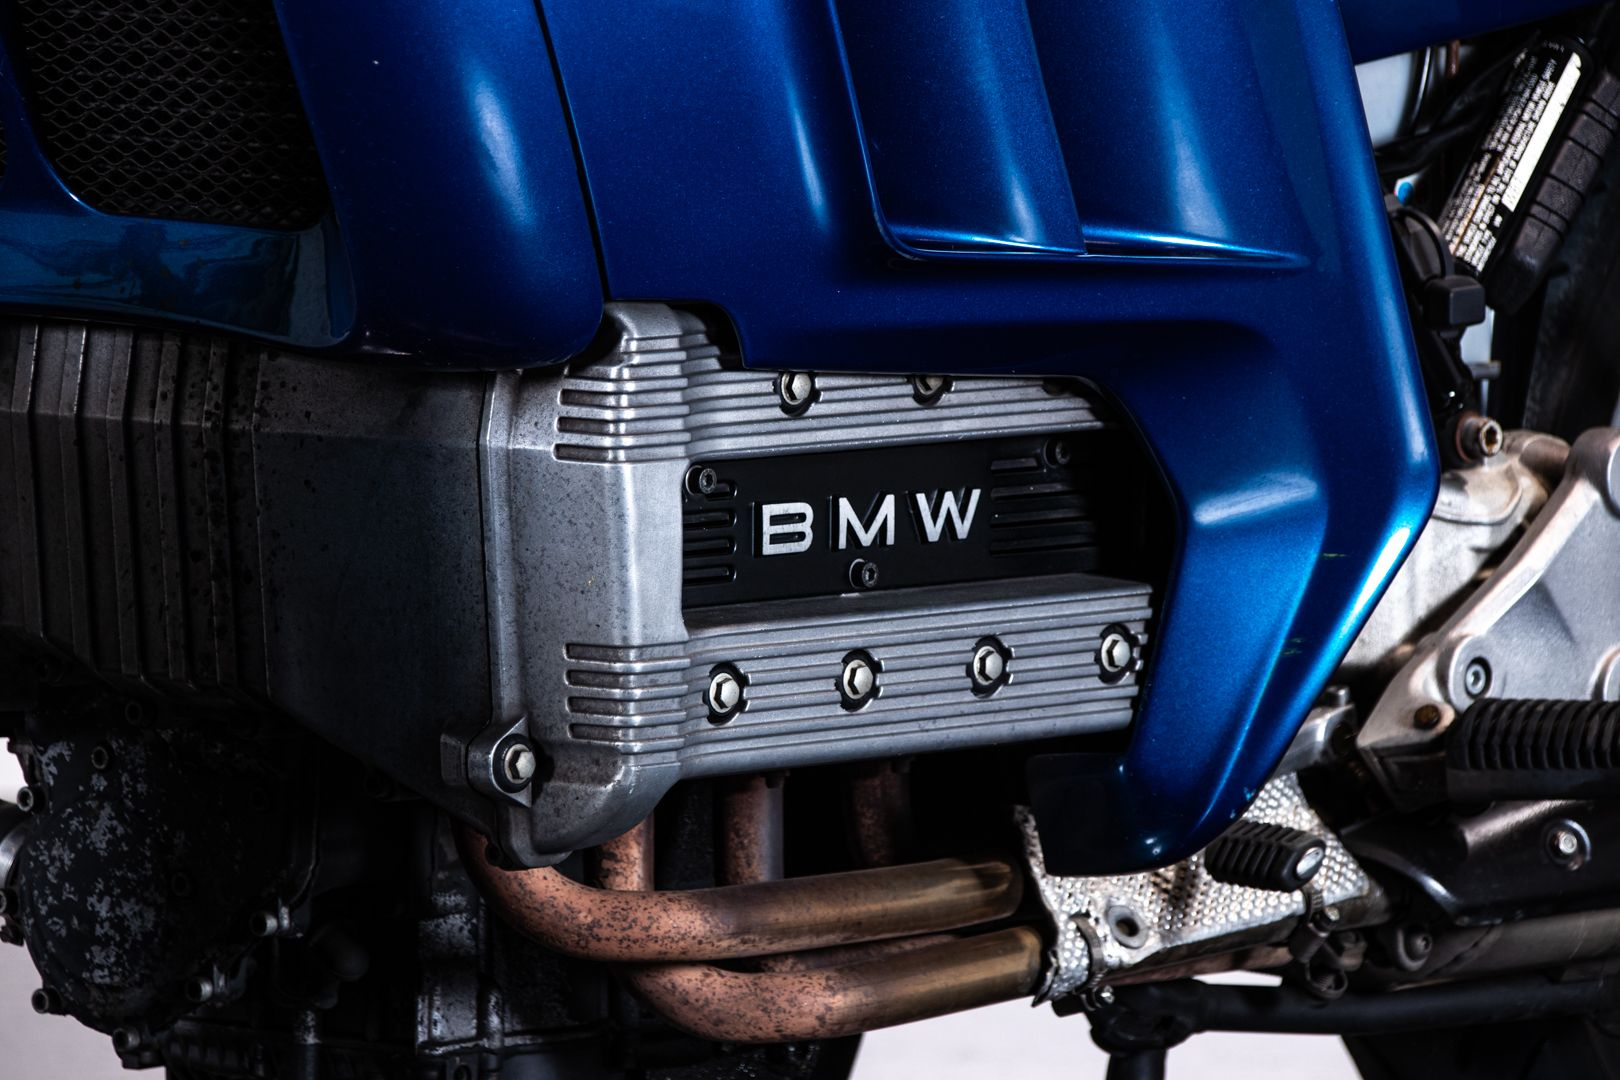 1989 BMW K 100 RT 64057